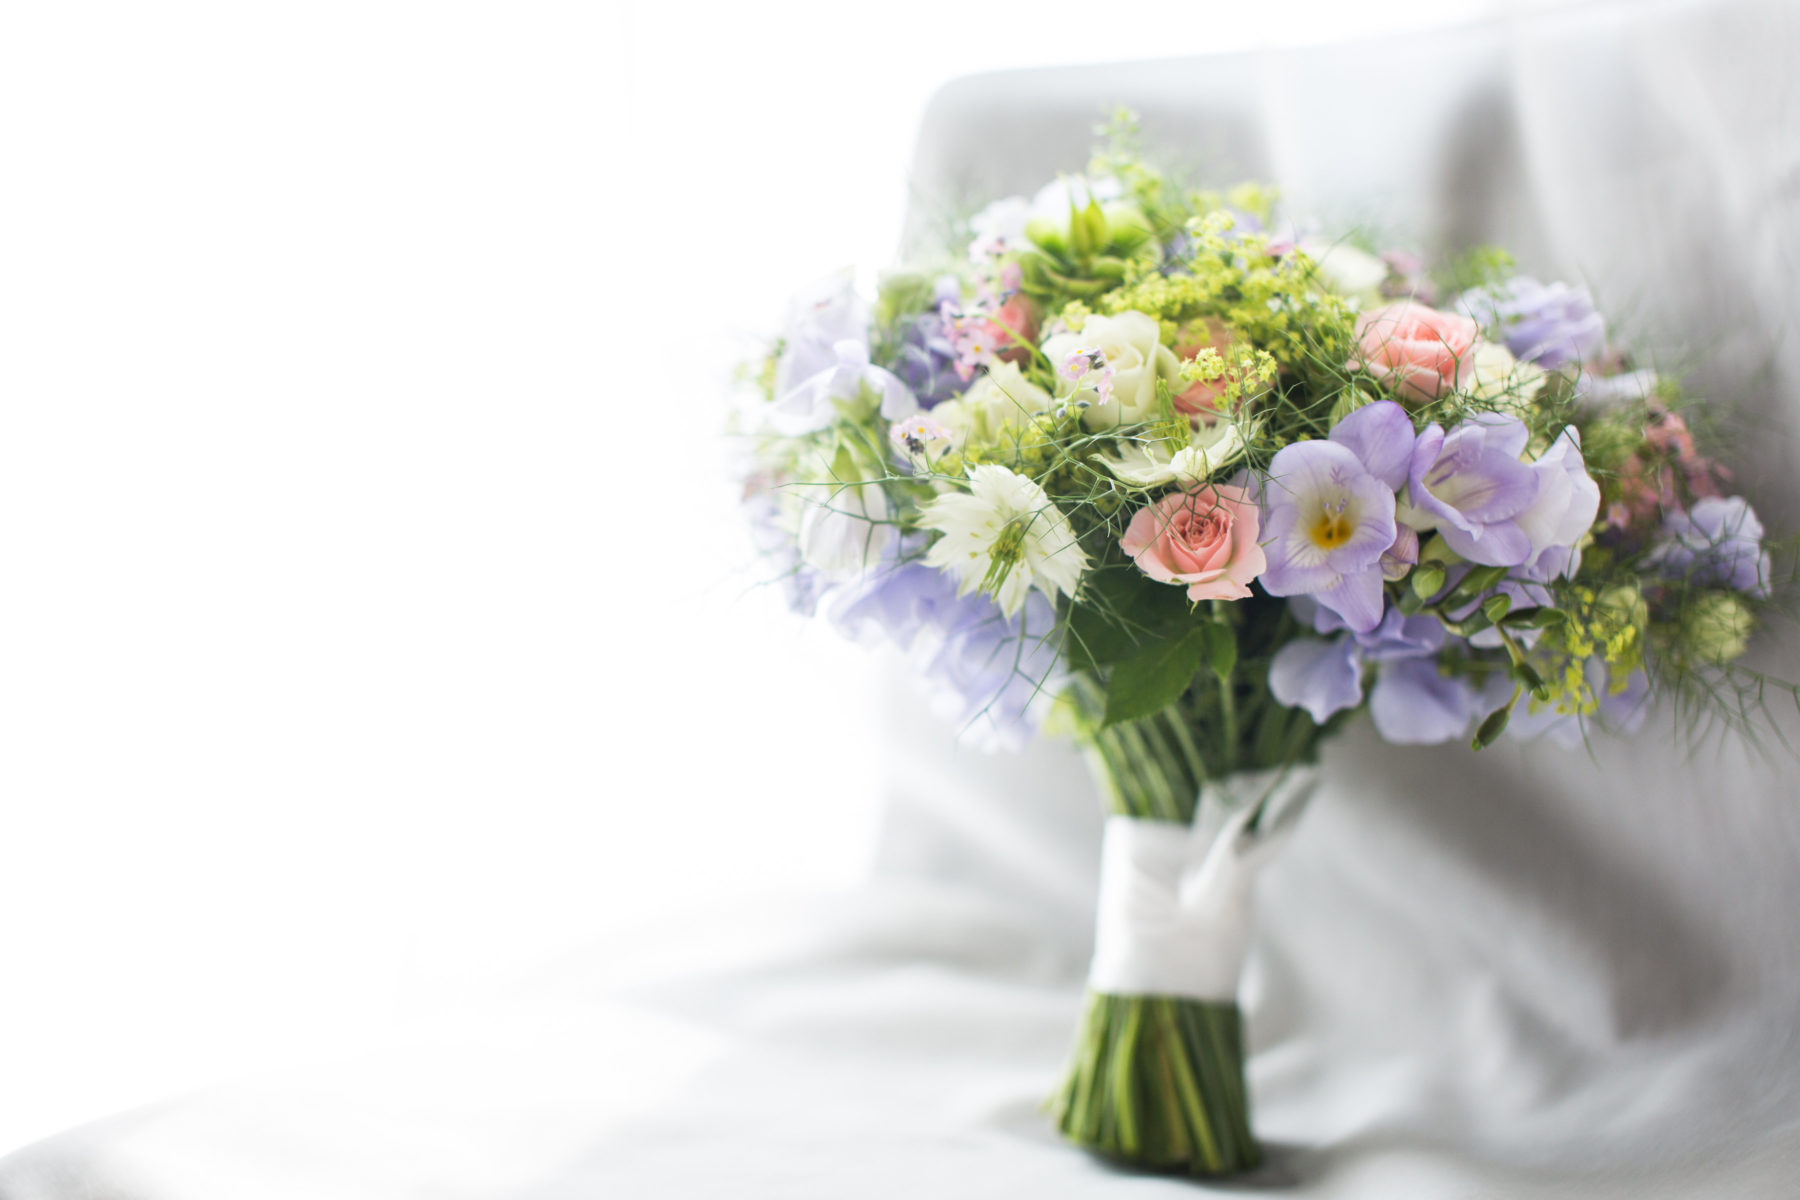 Wedding Shoes natural light wedding flowers